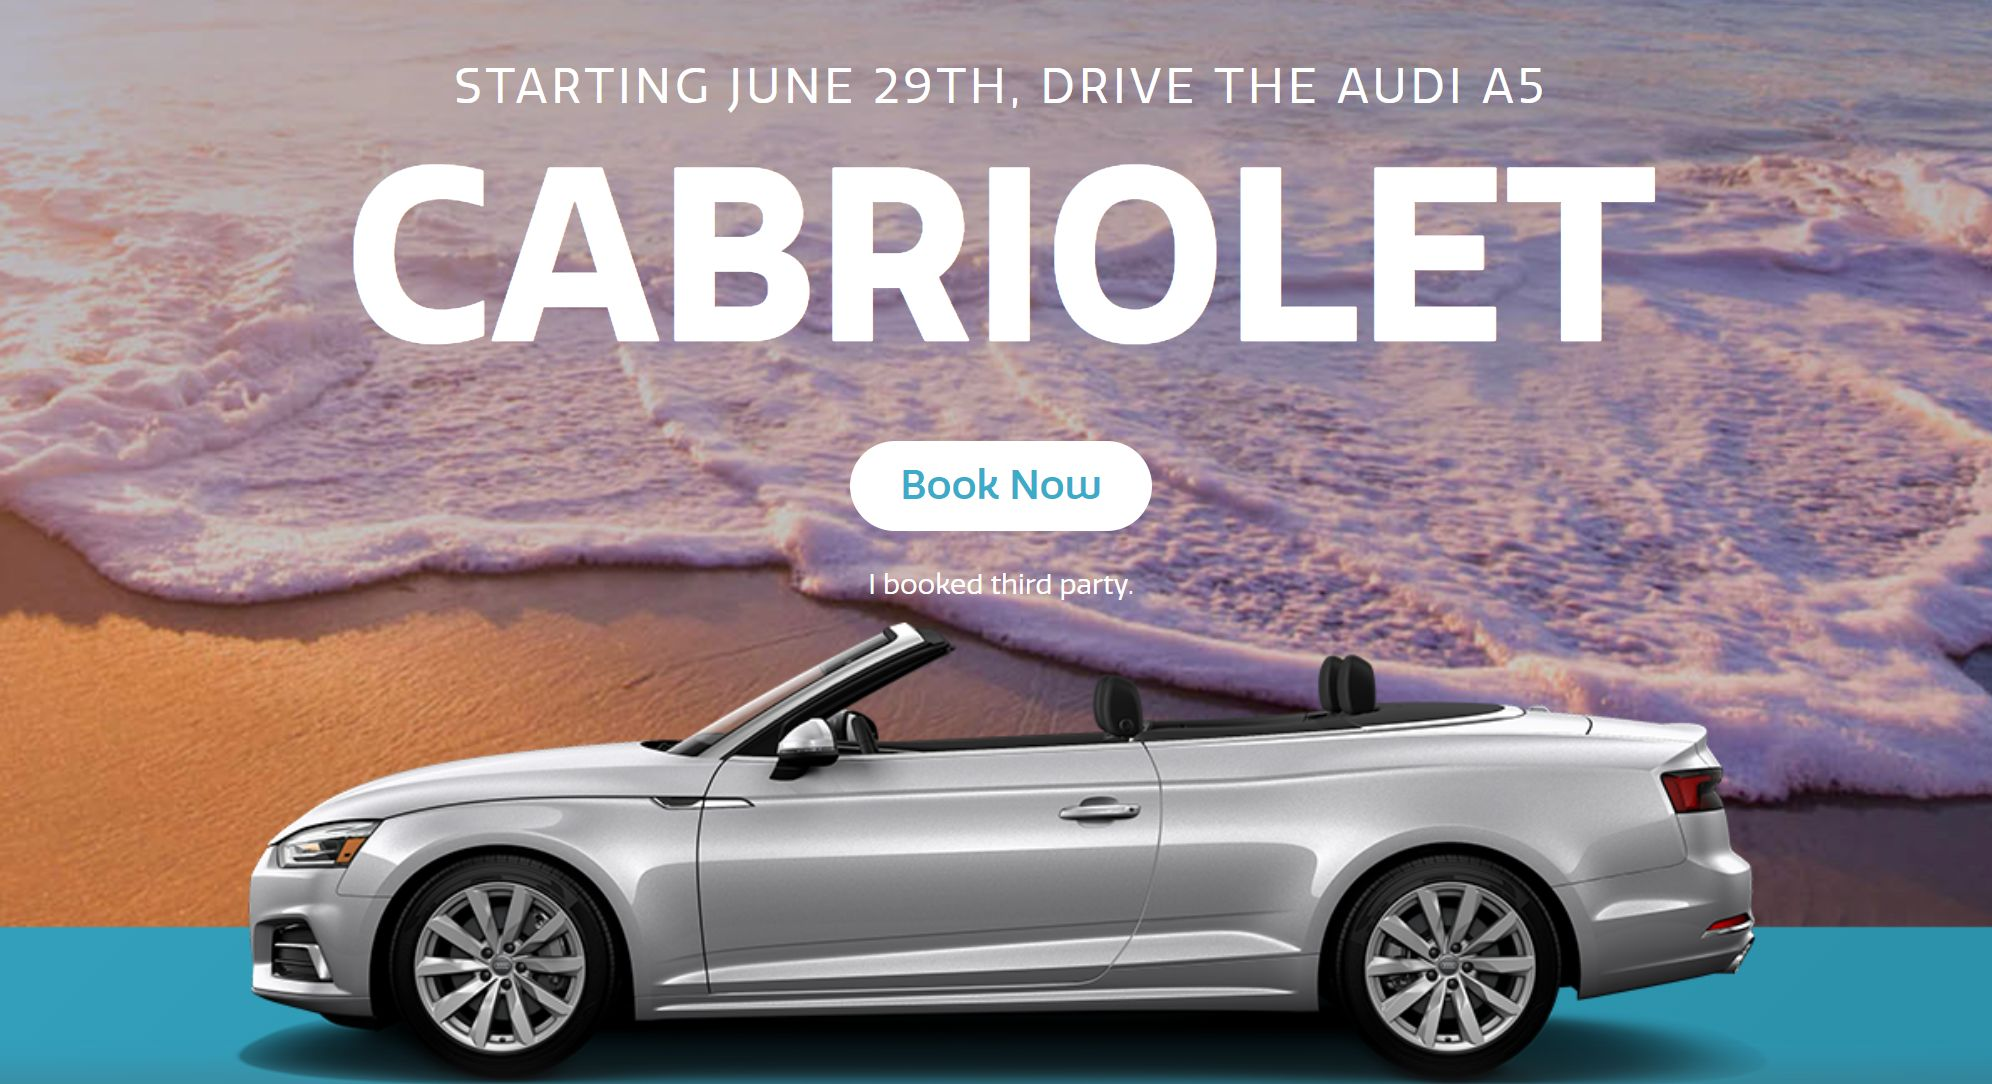 Silvercar Adds Audi A5 Convertible To Its Portfolio